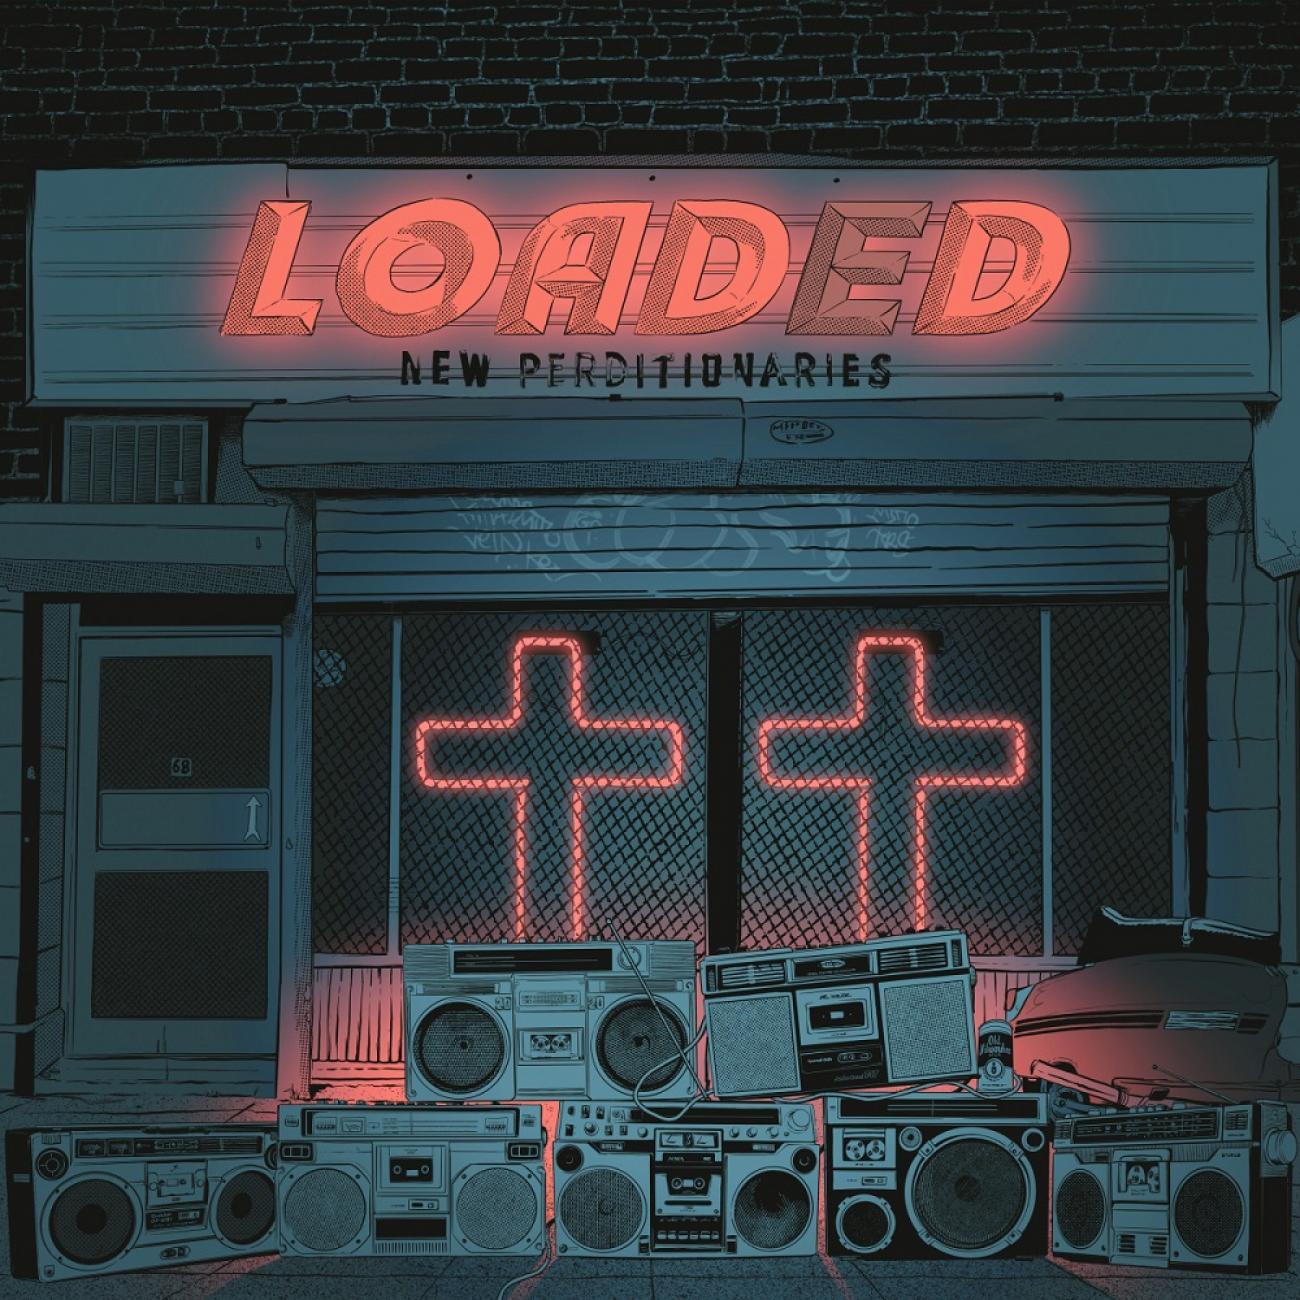 Loaded - New Perditionaries